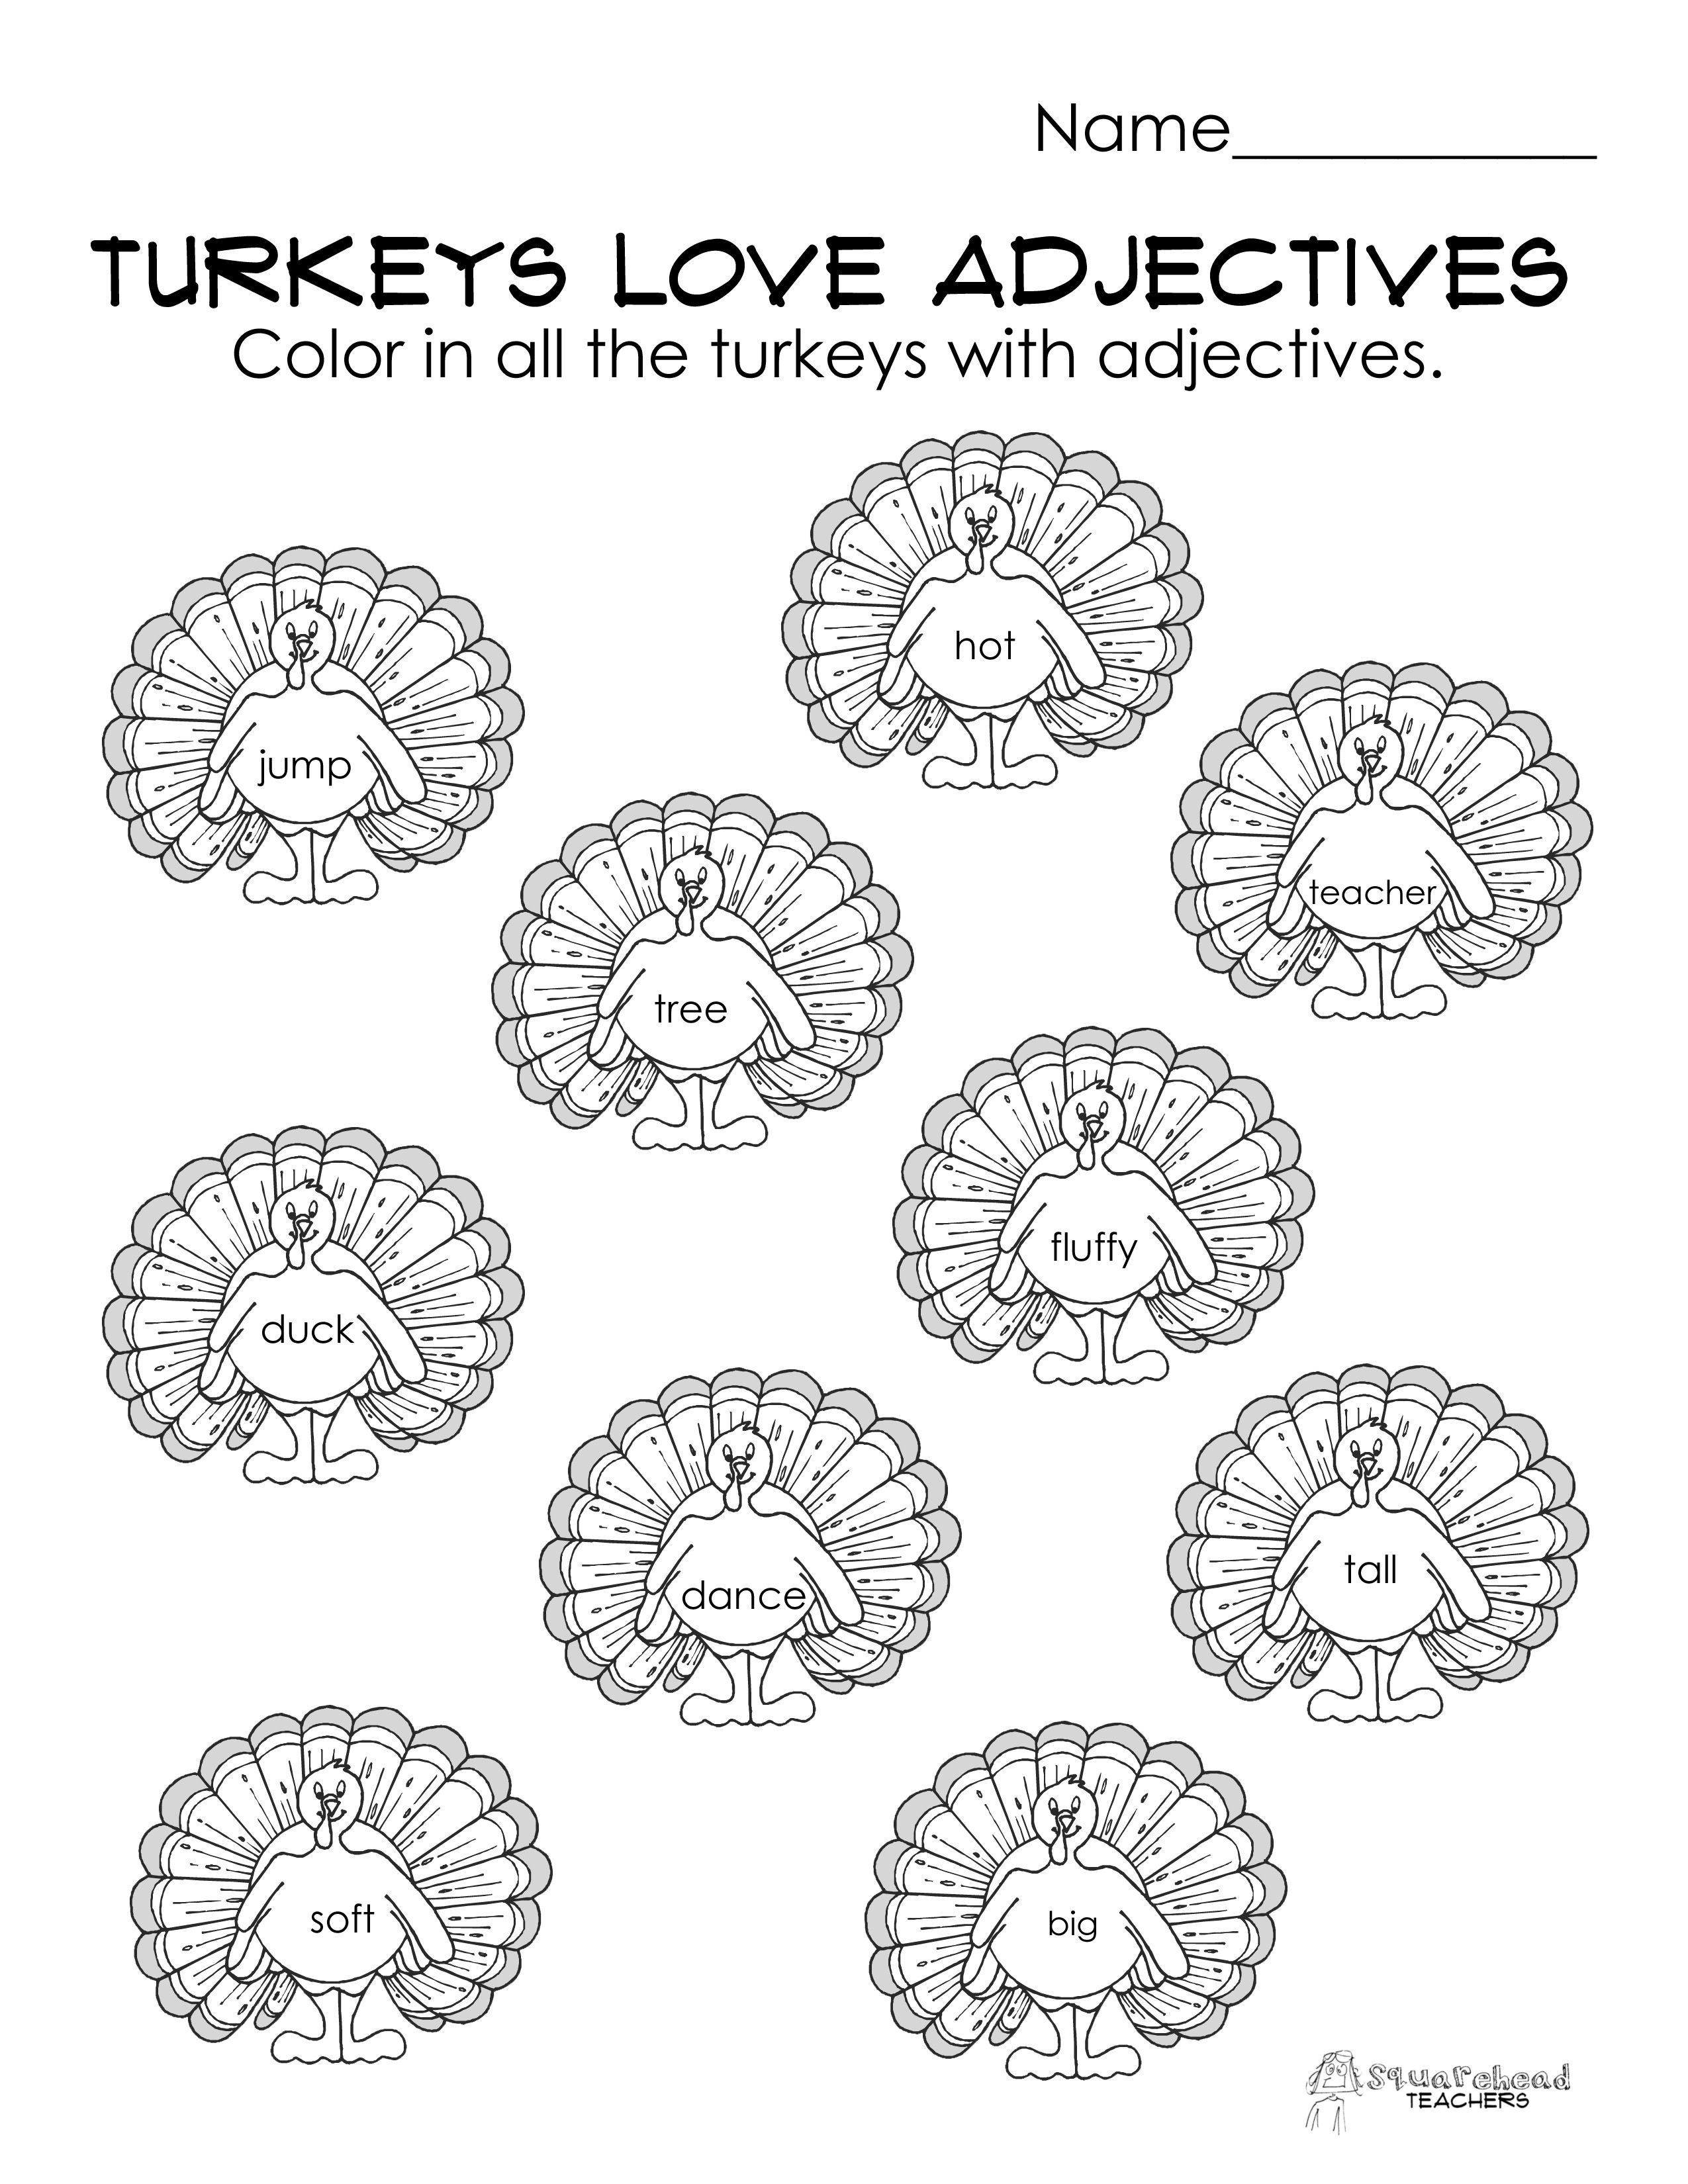 Turkeys Love Adjectives Free Parts Of Speech Worksheet Grammar Language Arts English Thanksg Parts Of Speech Worksheets Number Worksheets Worksheets Free [ 3300 x 2550 Pixel ]